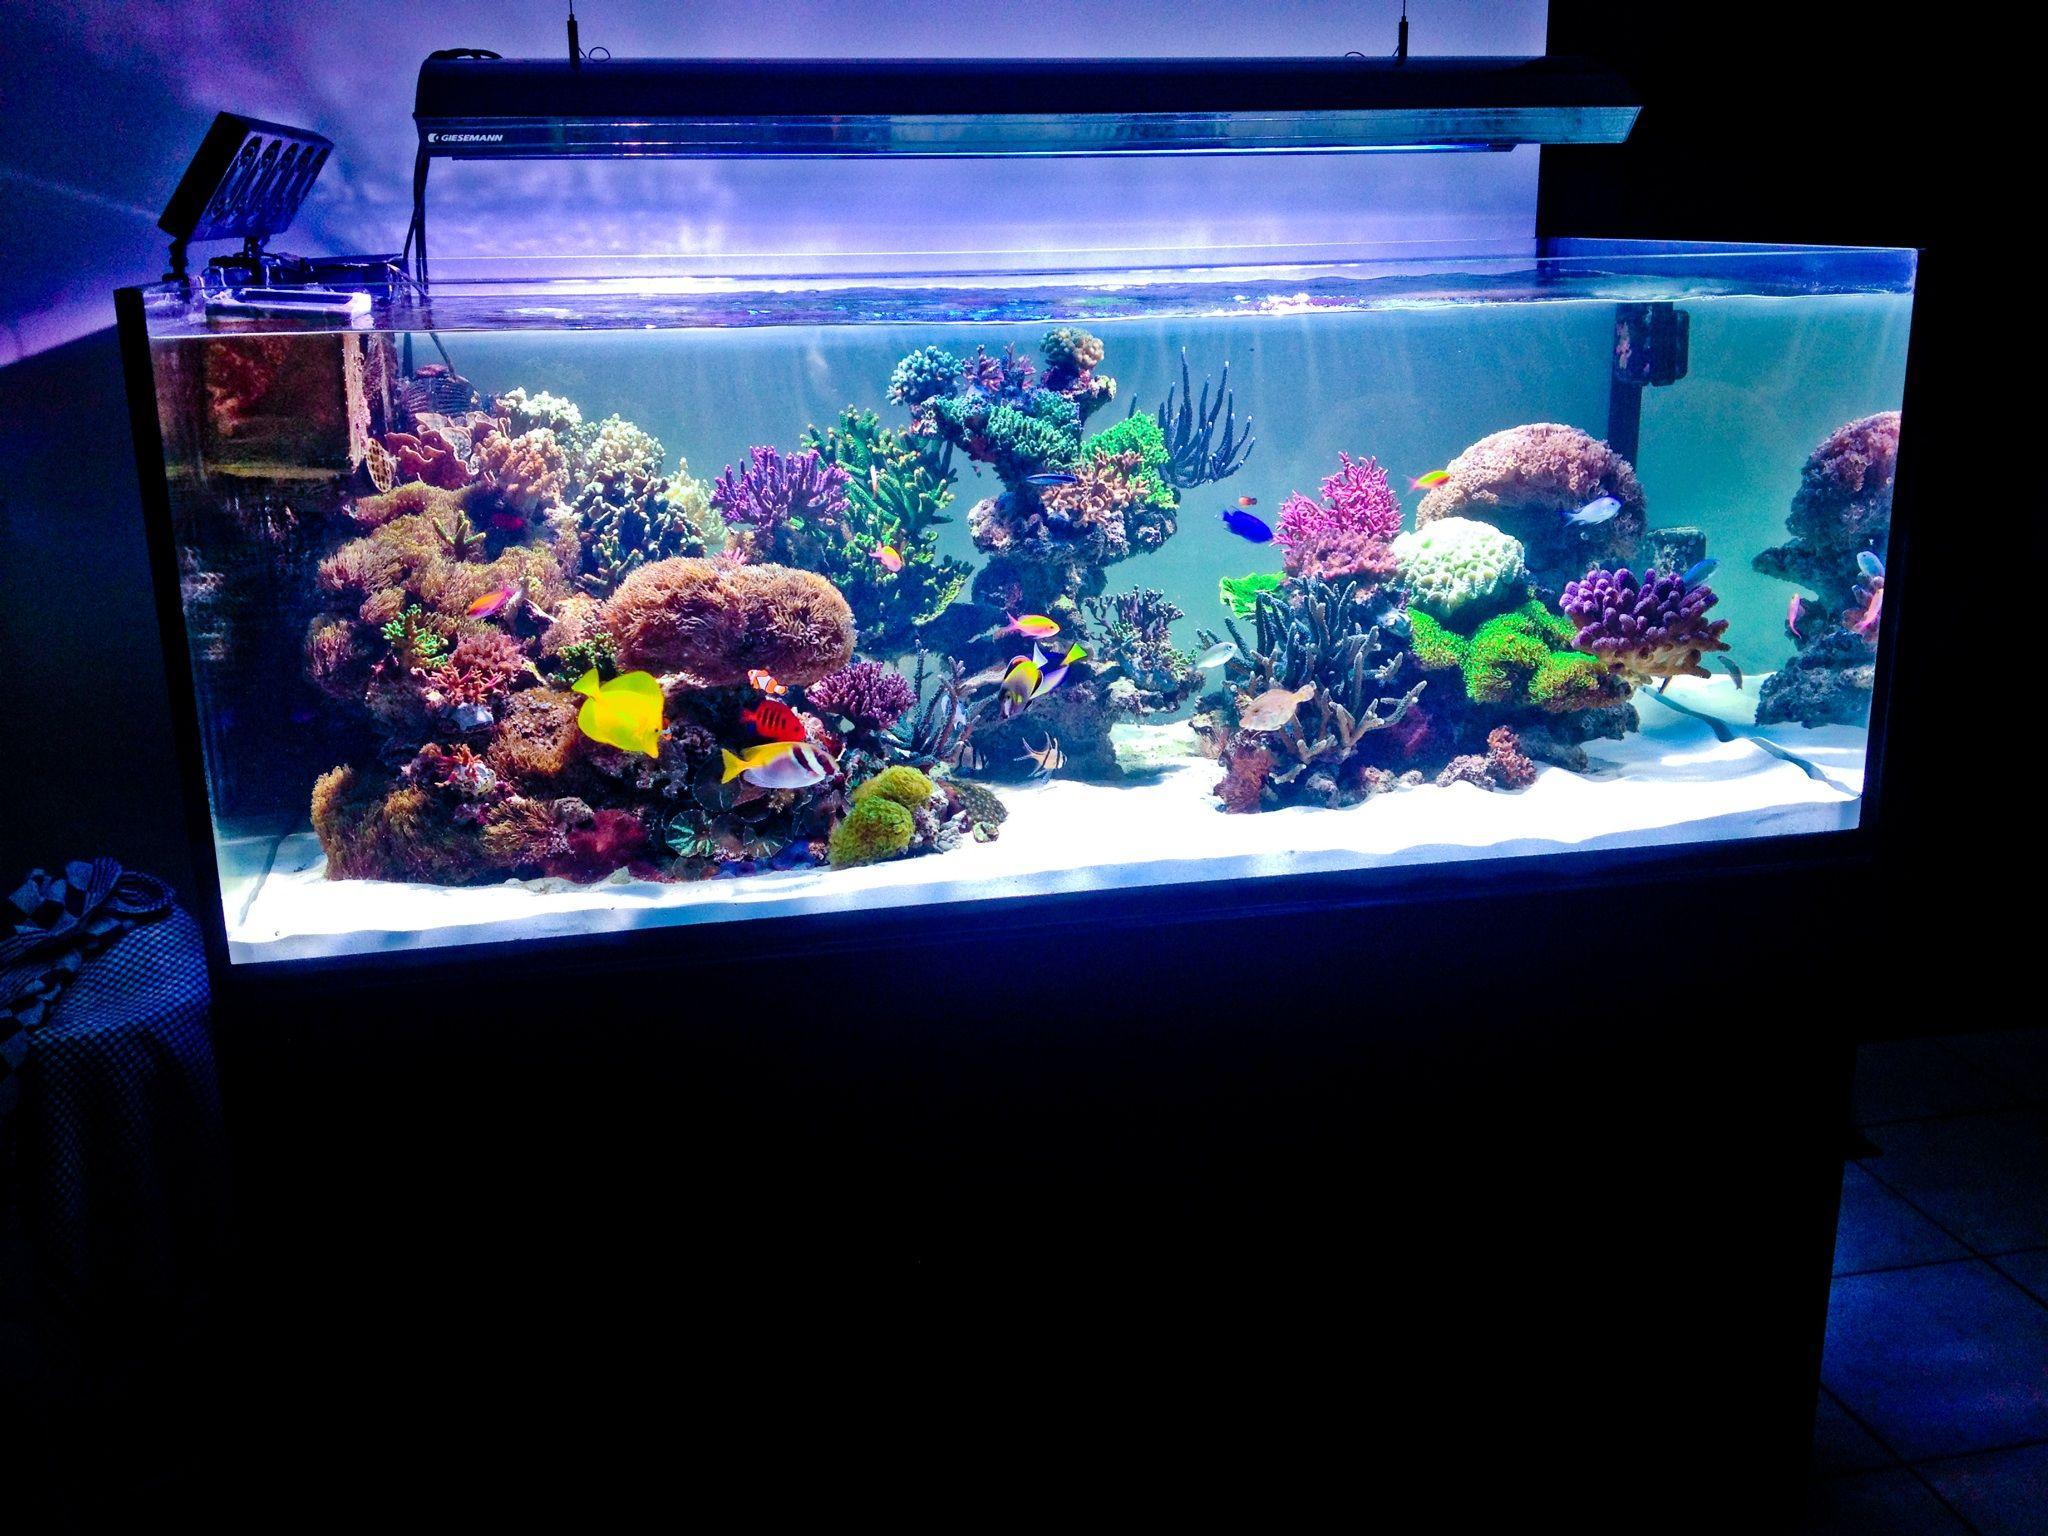 Elos 160 XL Damu0027s Aquarium